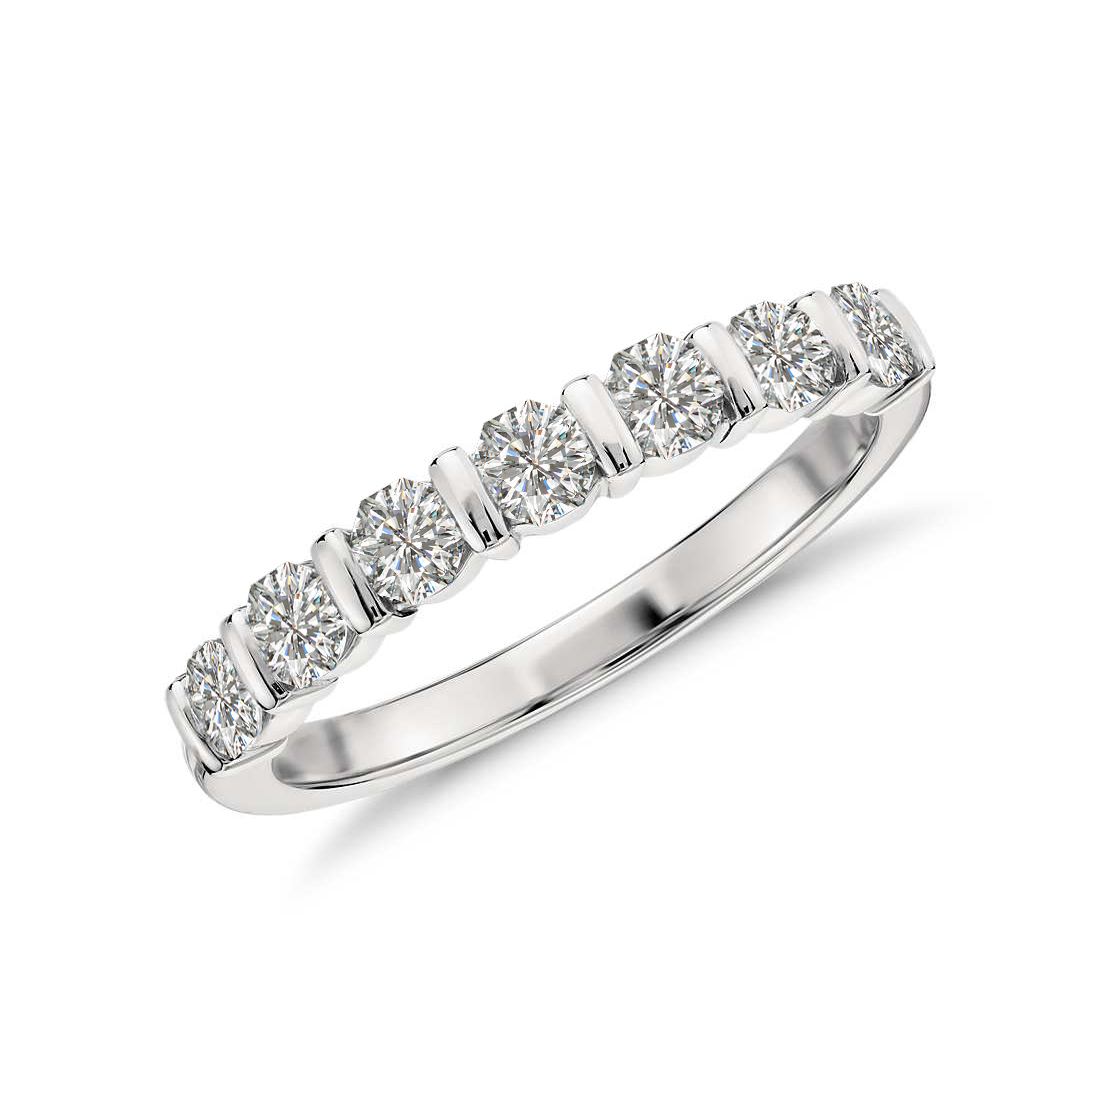 88-cut-bar-style-ring.jpg